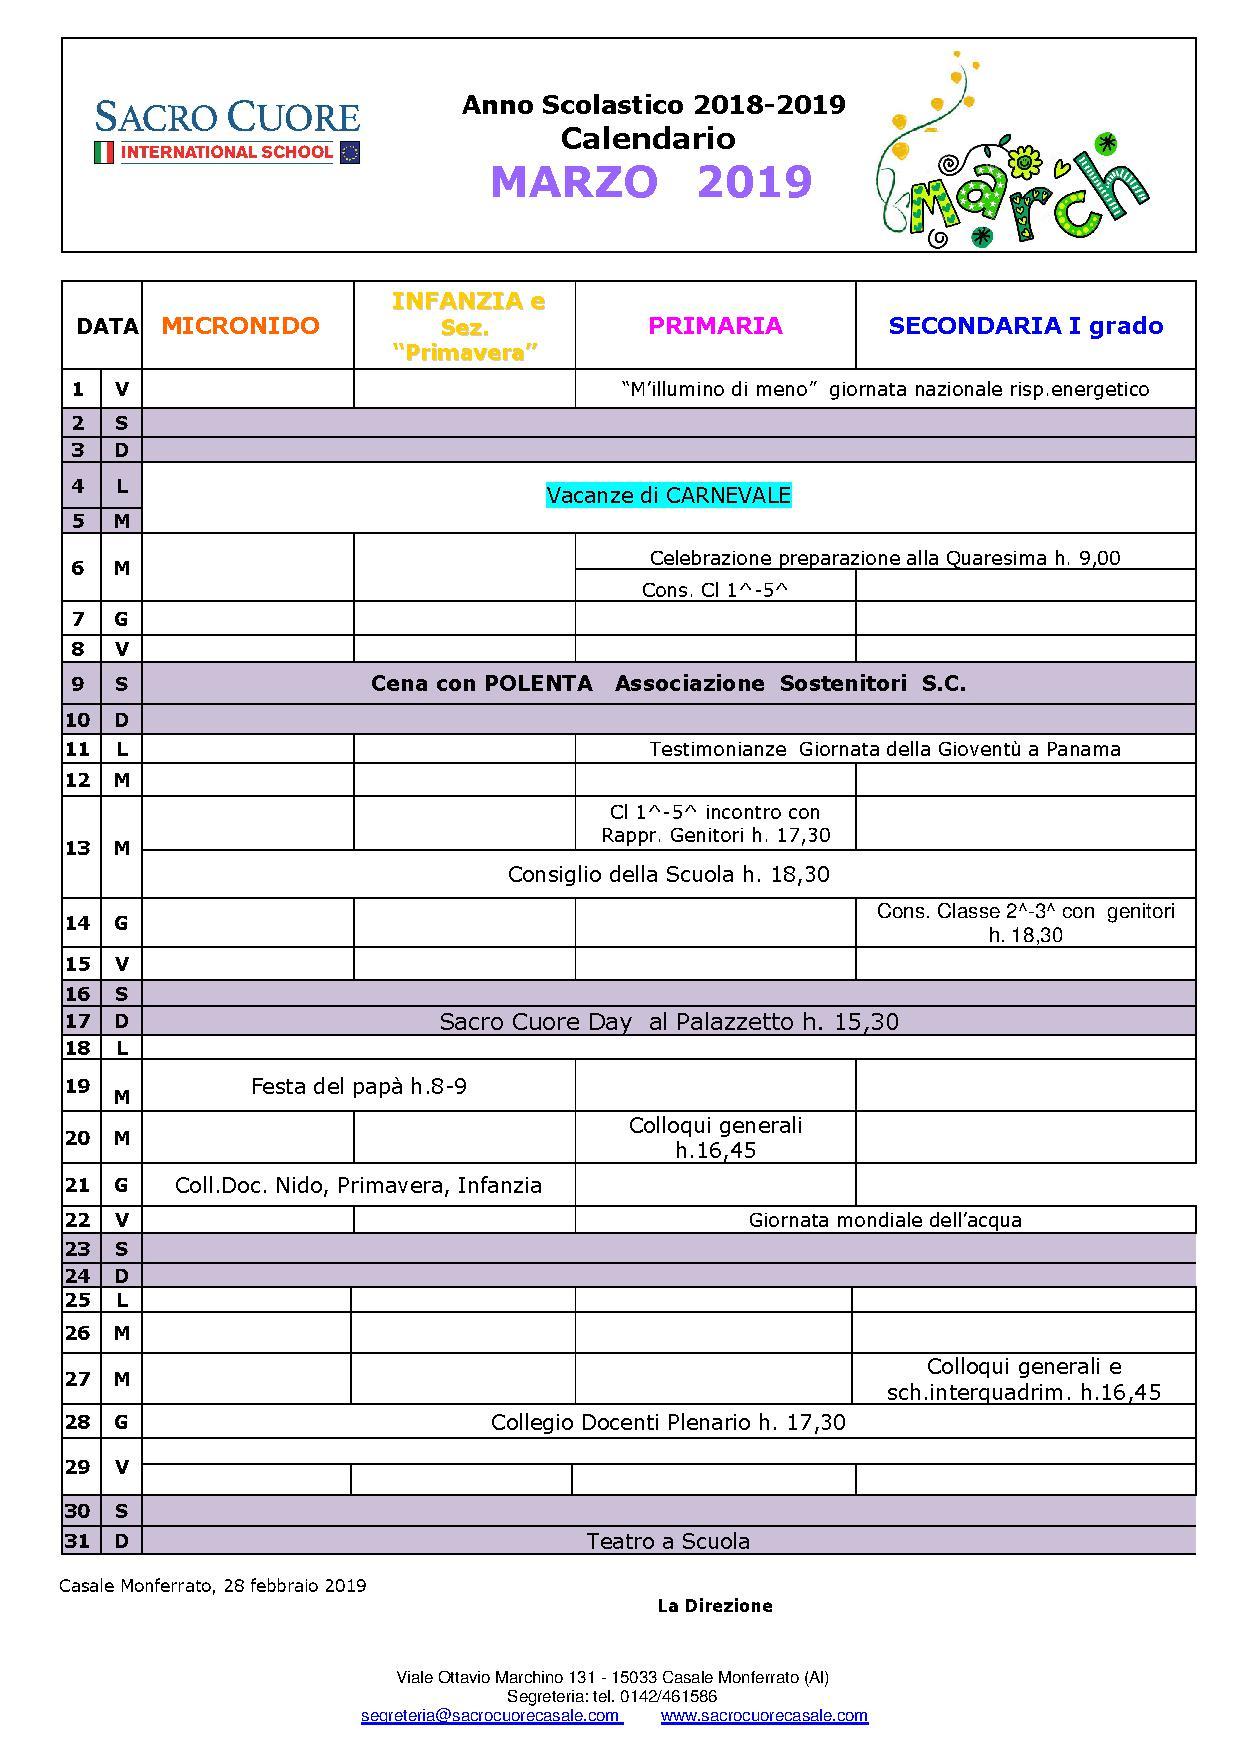 Calendario Di Marzo.Calendario Mese Di Marzo Sacro Cuore Casale Monferrato